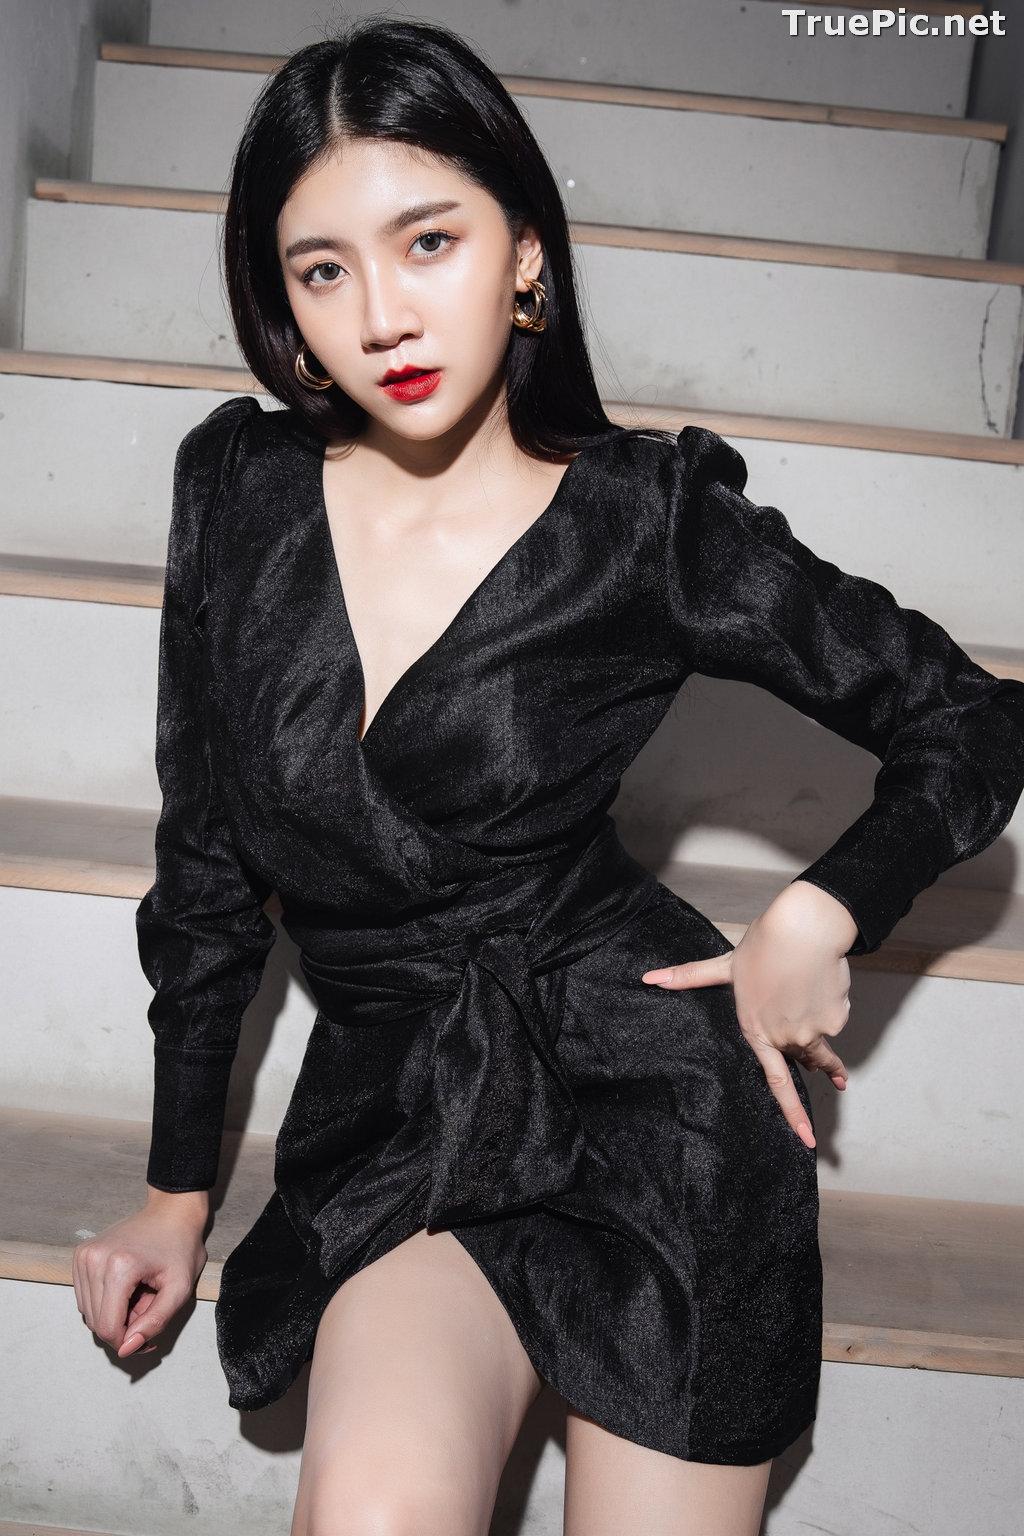 Image Thailand Model - Sasi Ngiunwan - Black For SiamNight - TruePic.net - Picture-17